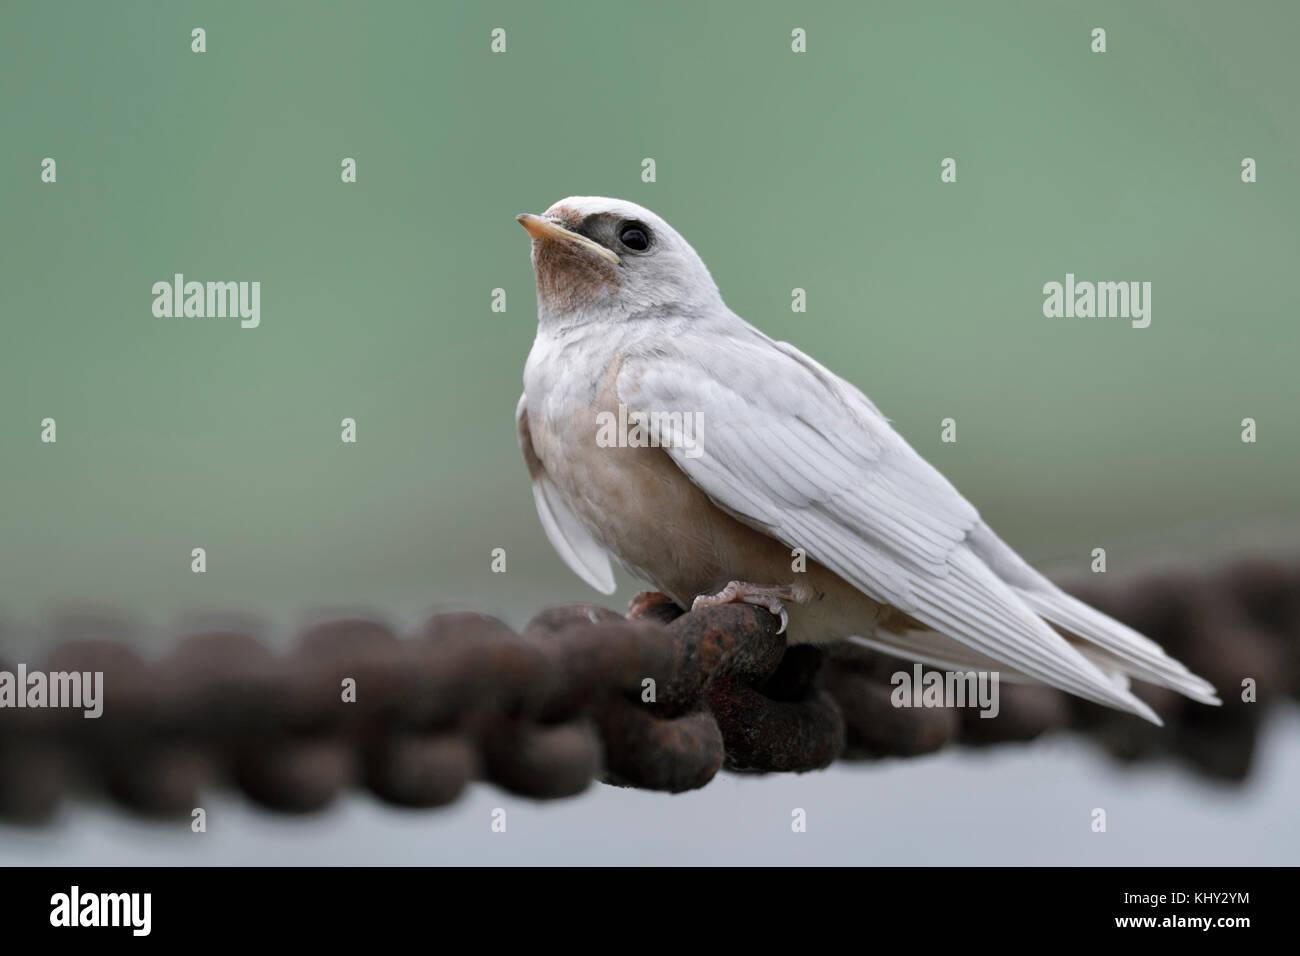 Barn Swallow ( Hirundo rustica ), just fledged, gene mutation, white plumage, leucistic, leucism, perched on a massive - Stock Image